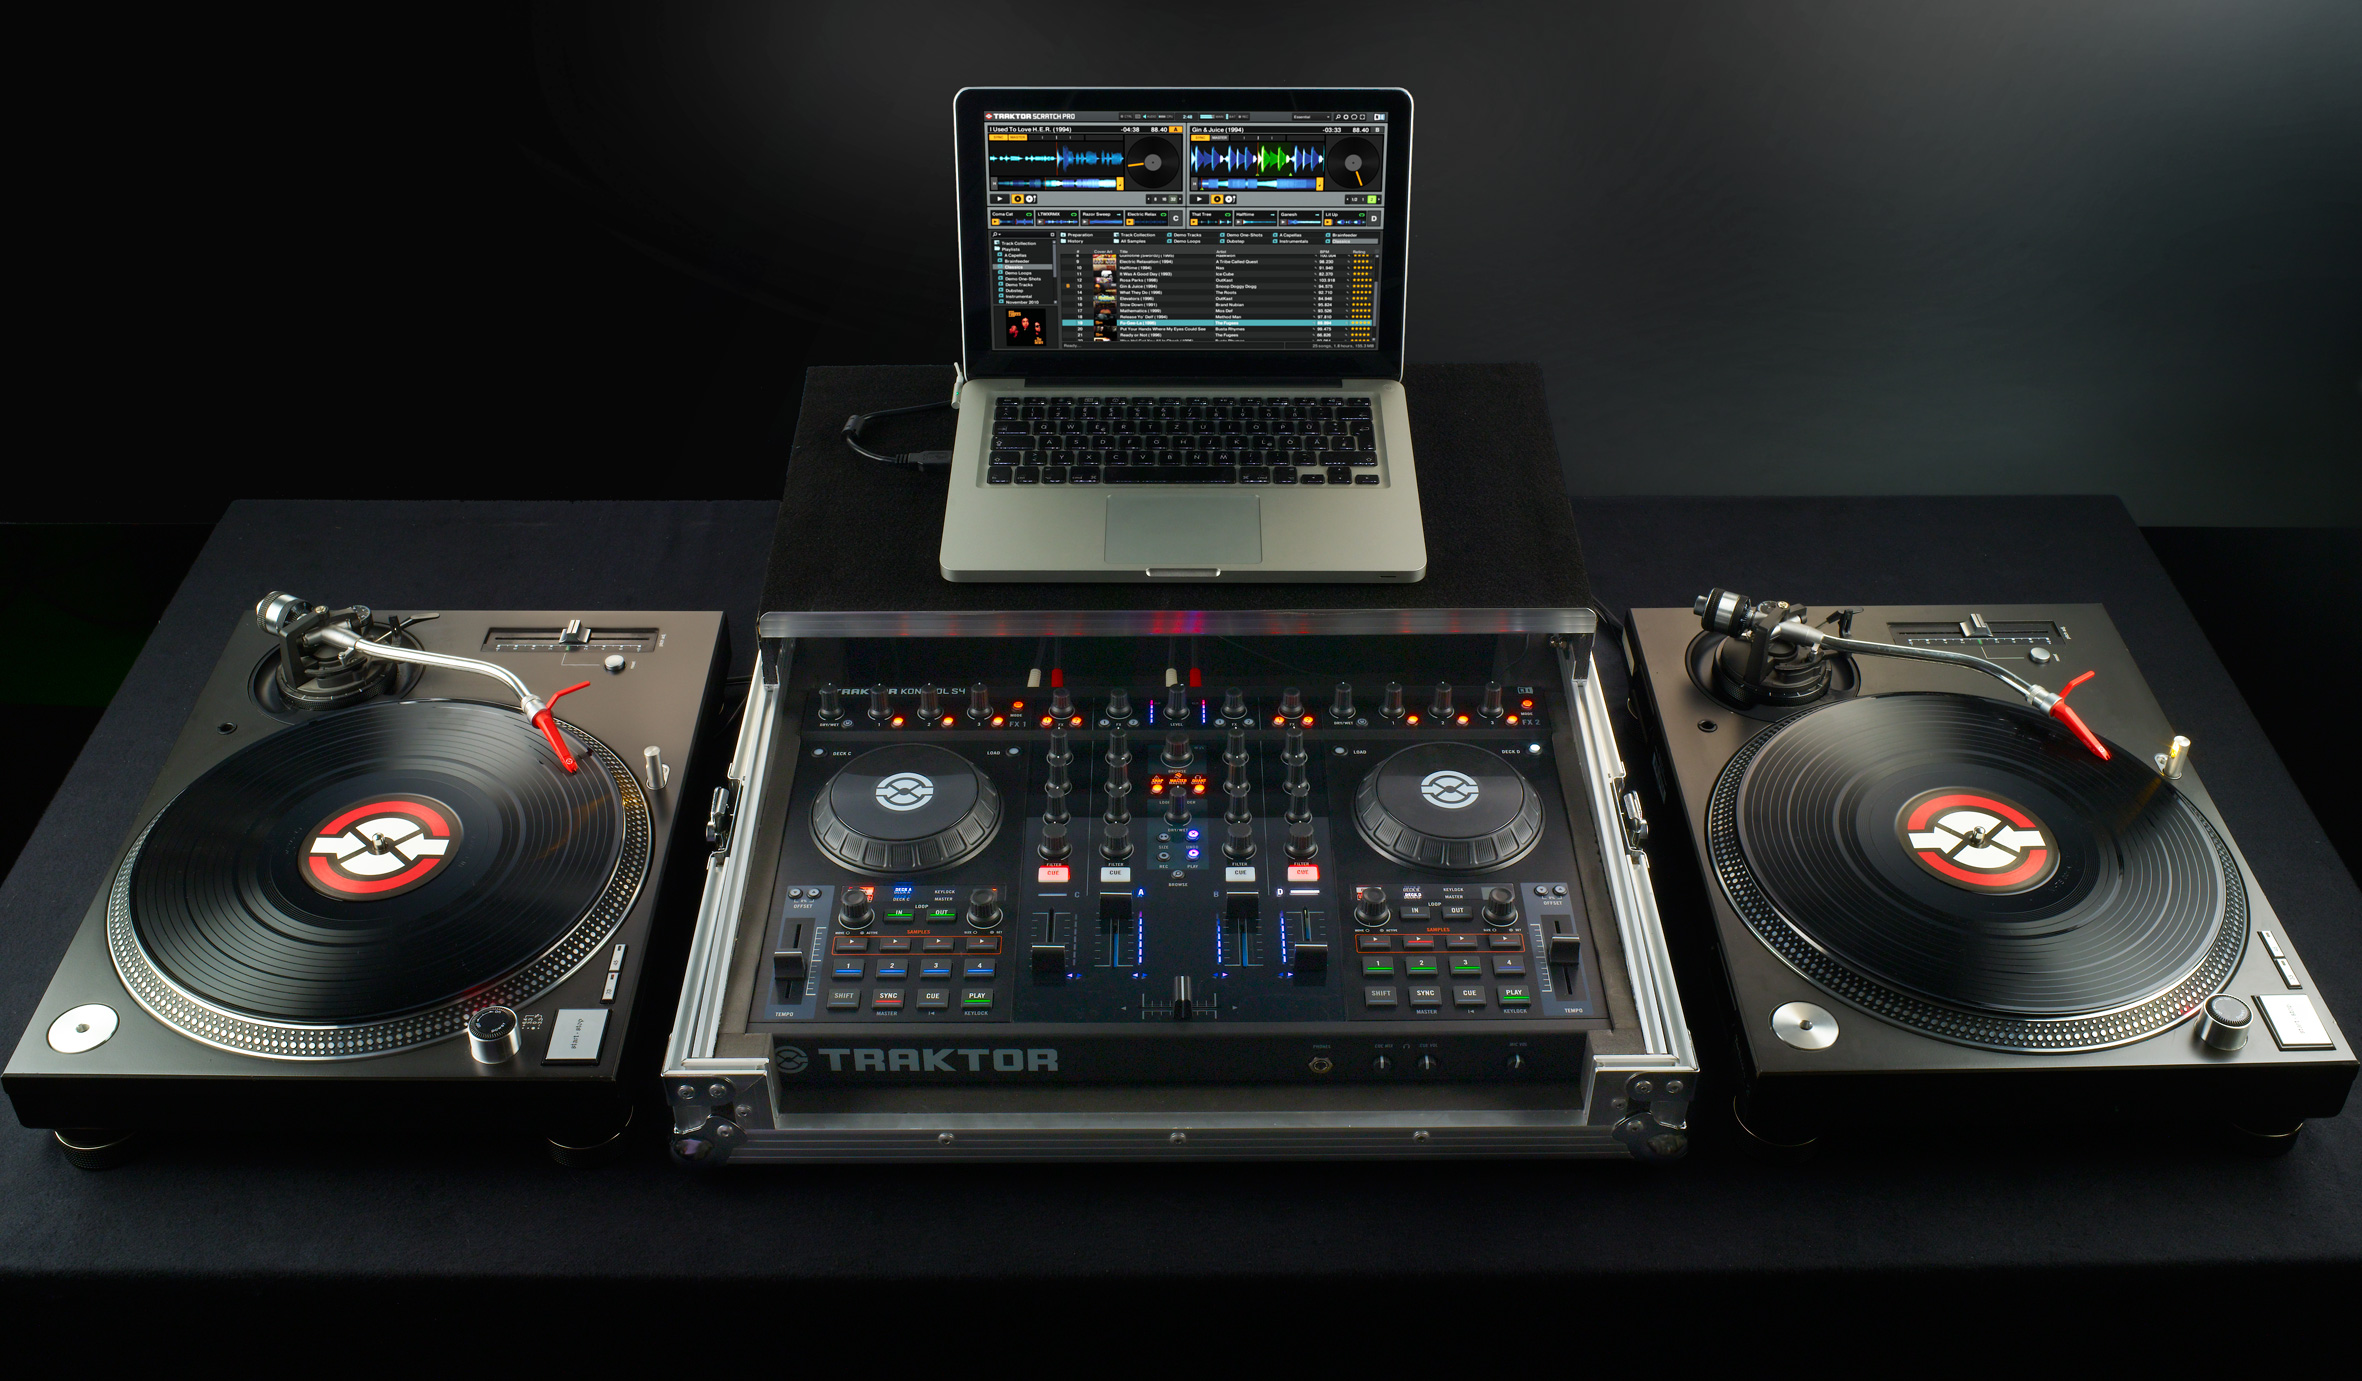 Traktor Kontrol vs Serato DJ 1 7 1Traktor Z2 Case